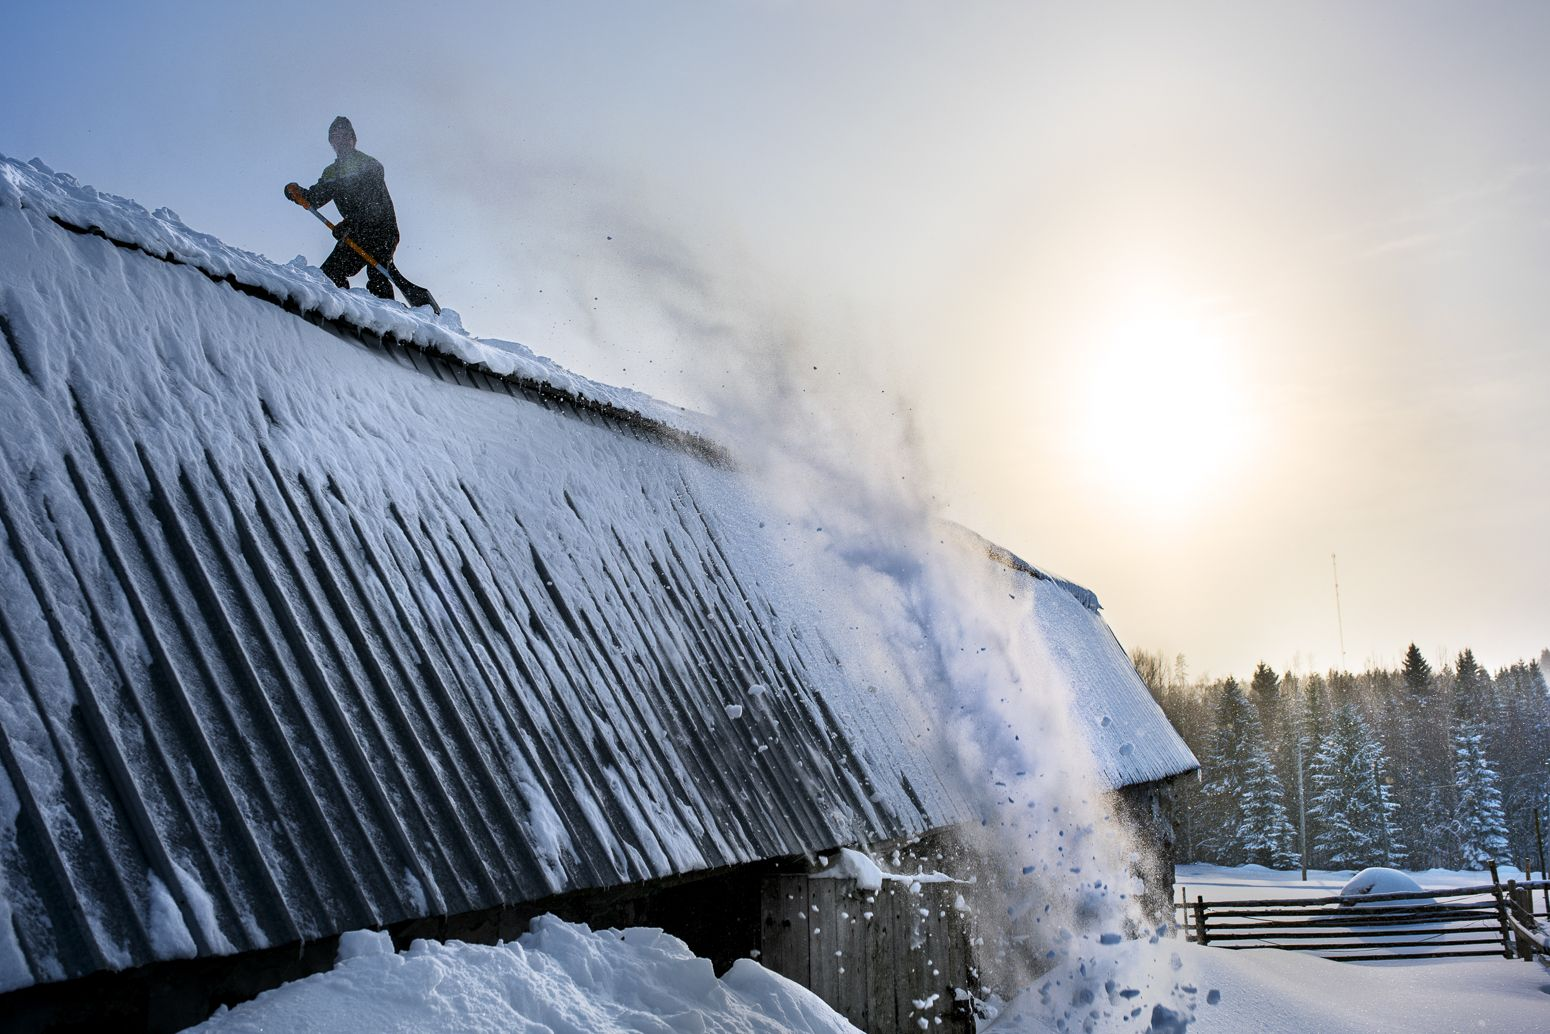 Lumenpudottaja. Snow. Extreme. Outdoor.  Photo by Mikael Ahlfors.